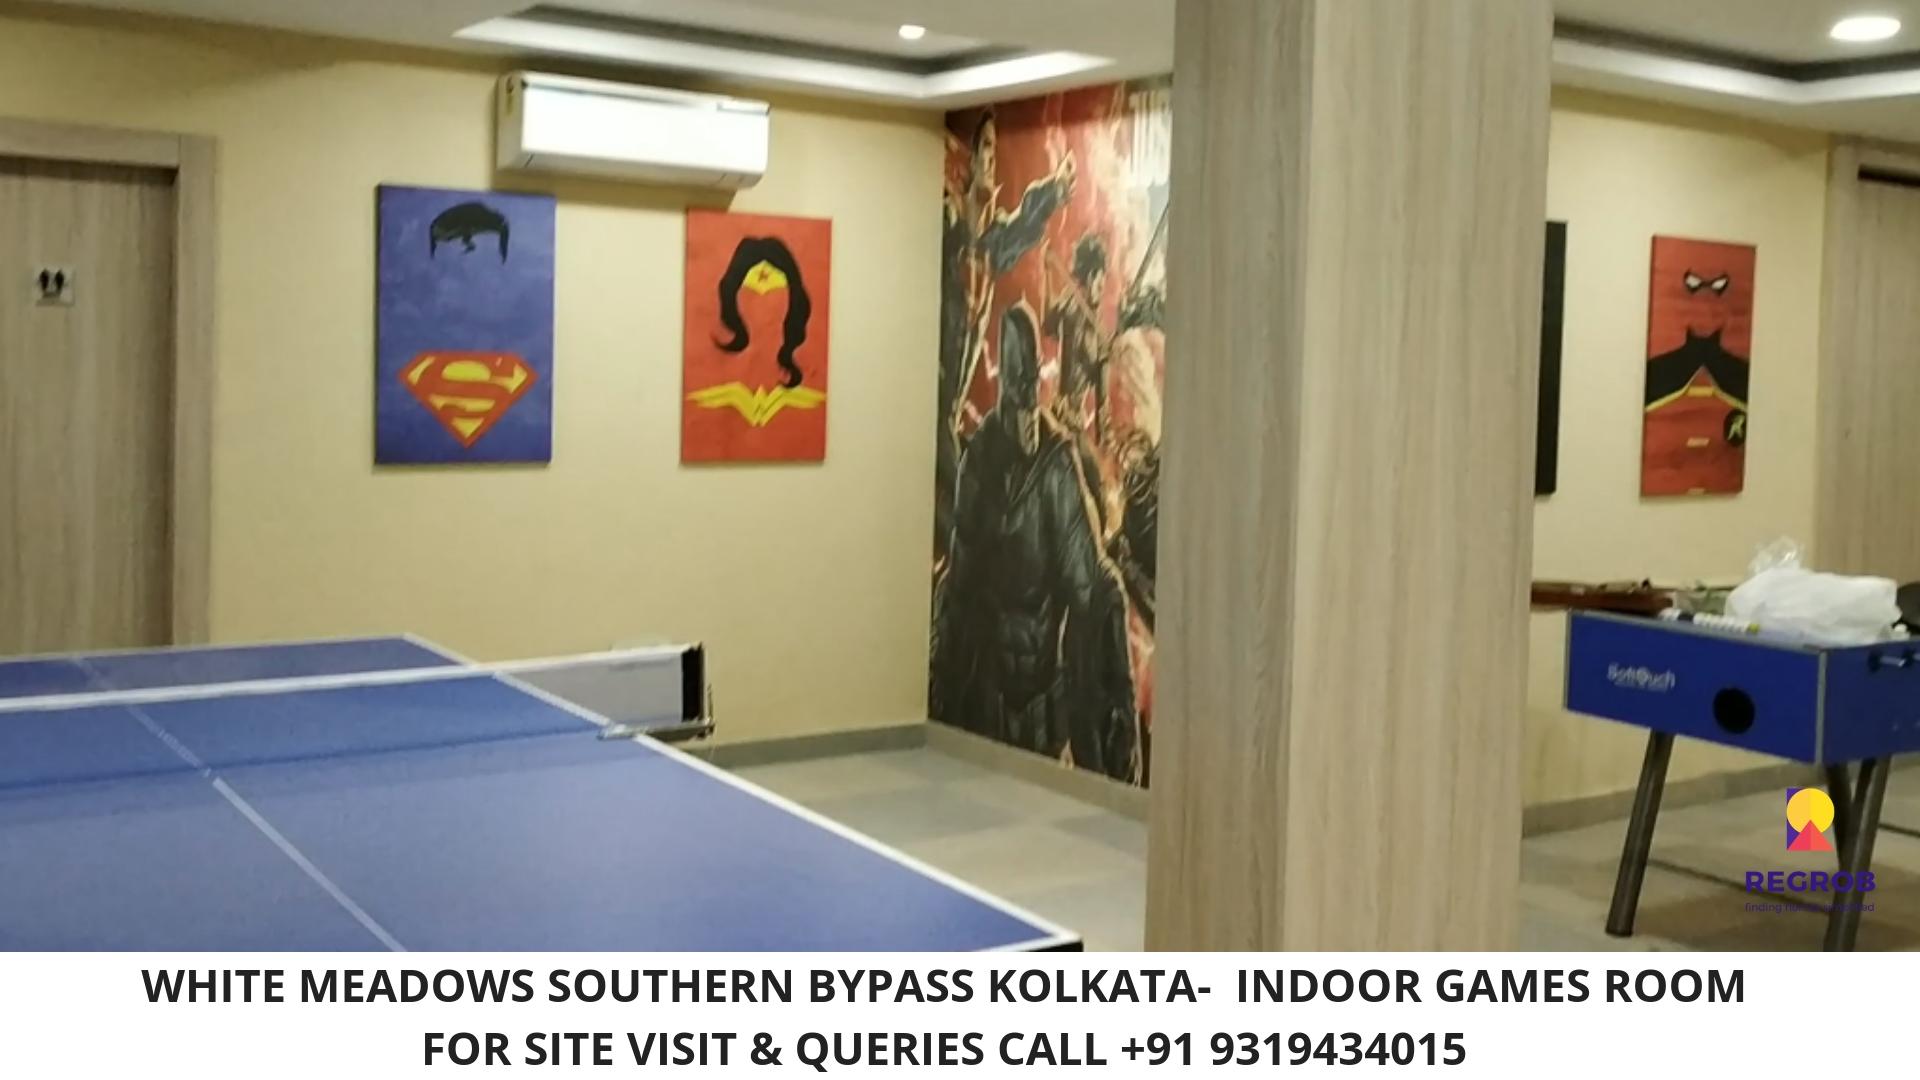 White Meadows Phase 2 Southern Bypass Kolkata